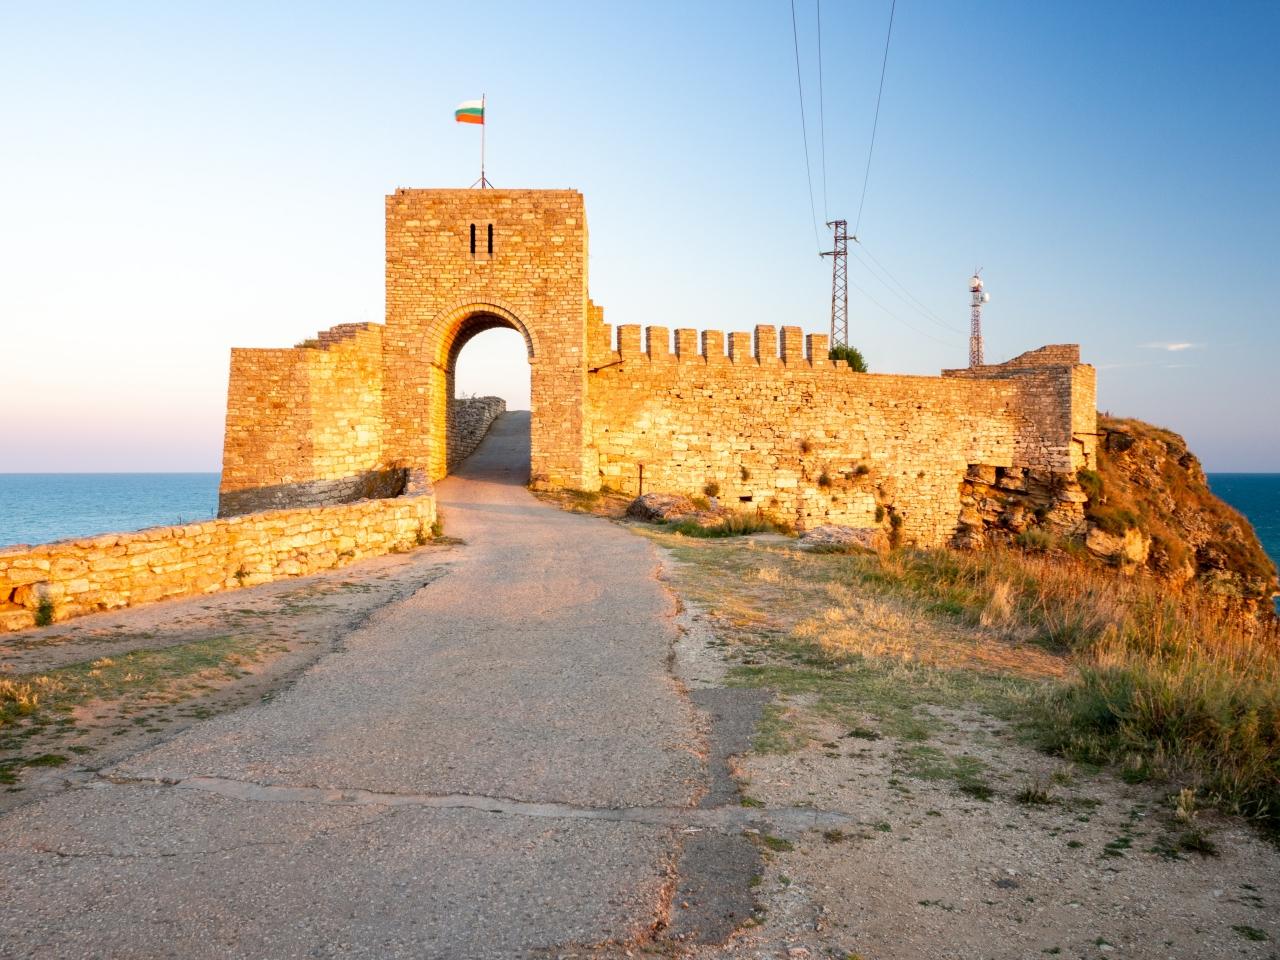 A medieval fortress in Kaliarkra Bulgaria